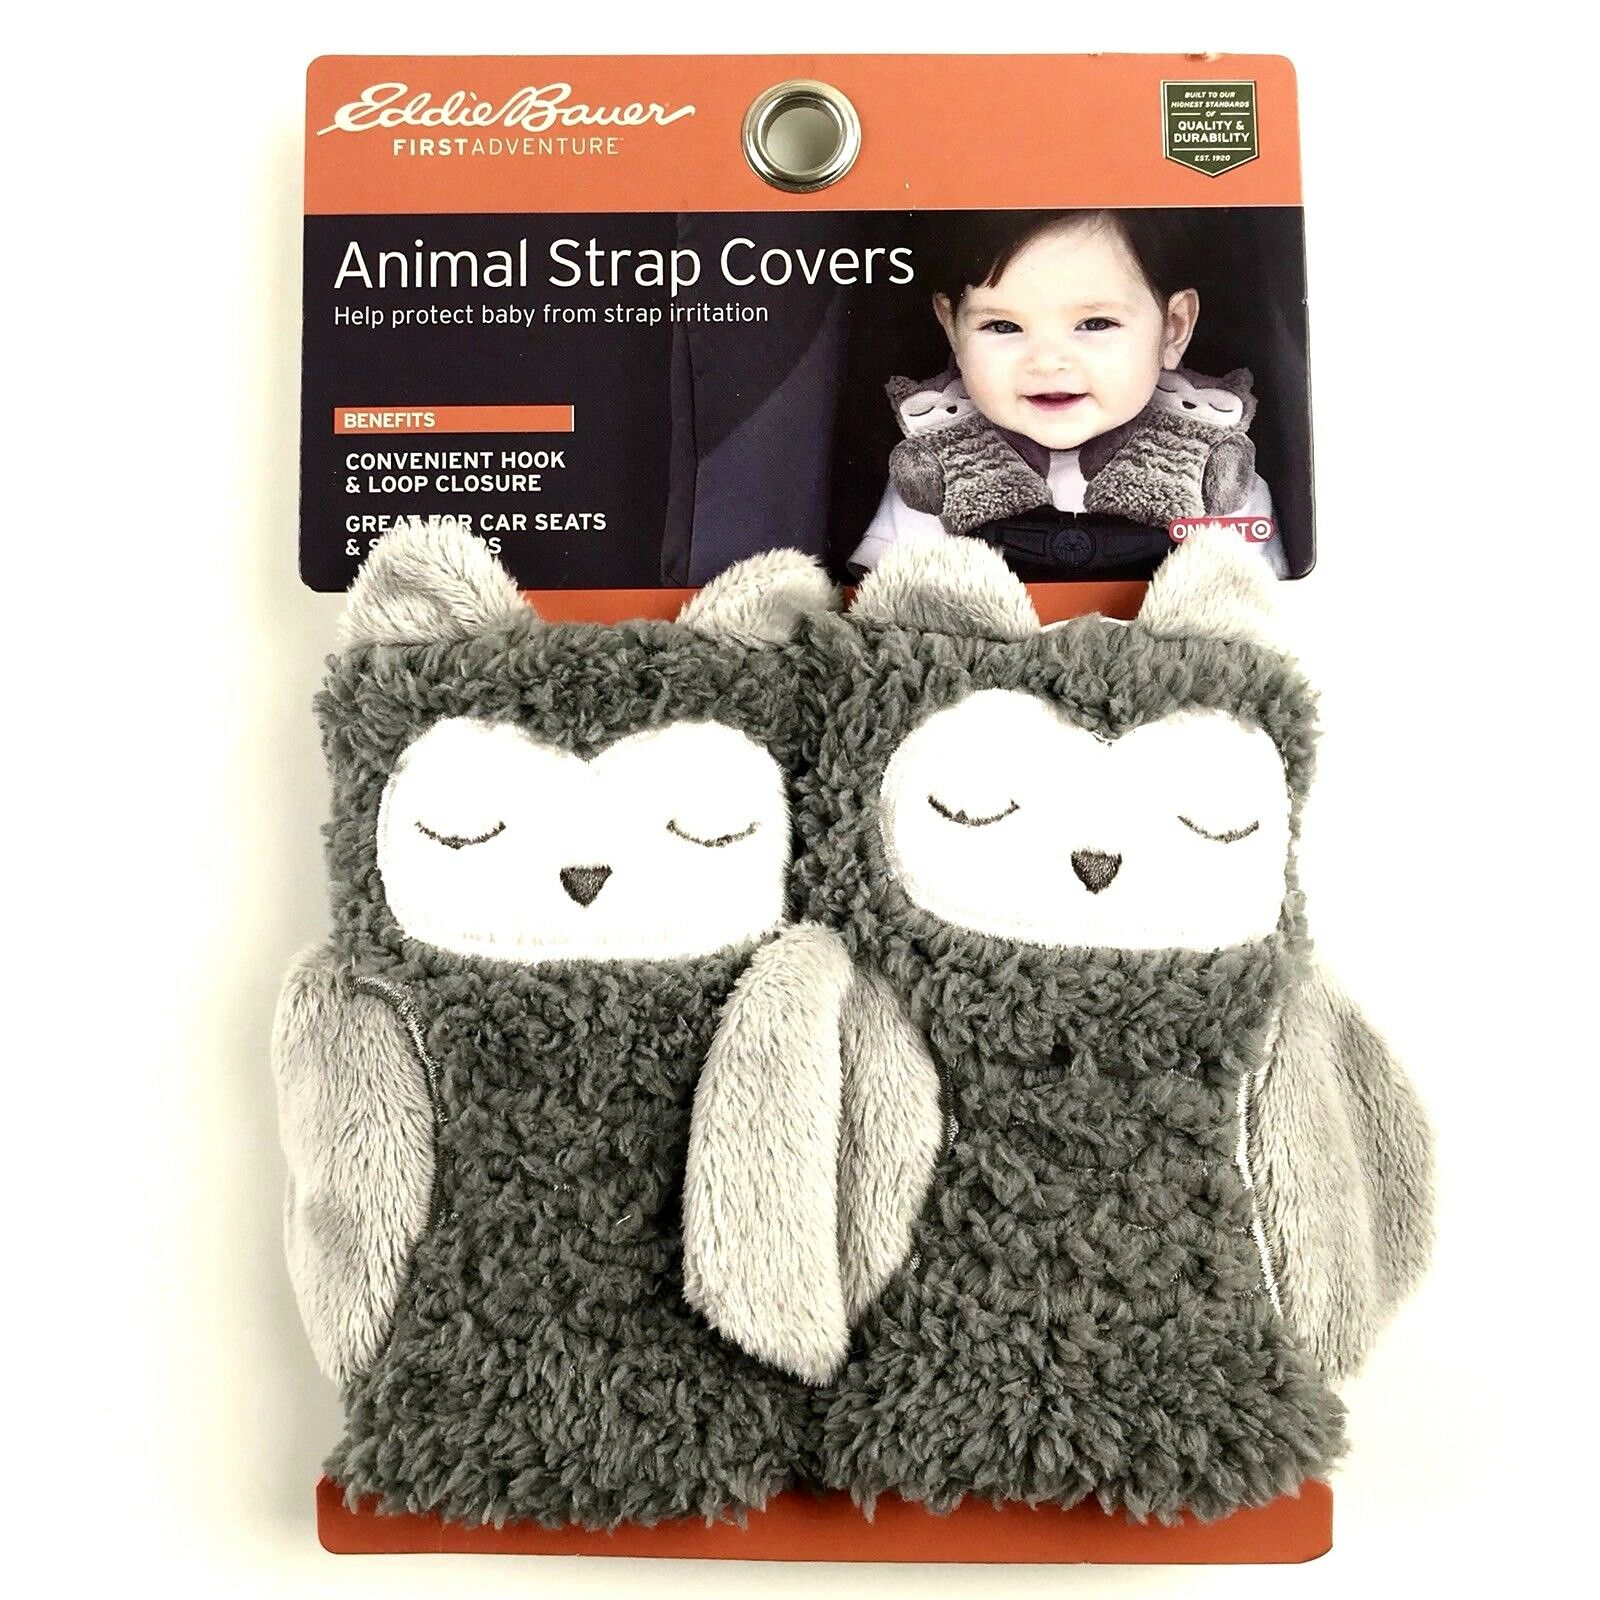 Eddie Bauer® Animal Strap Covers - Owl